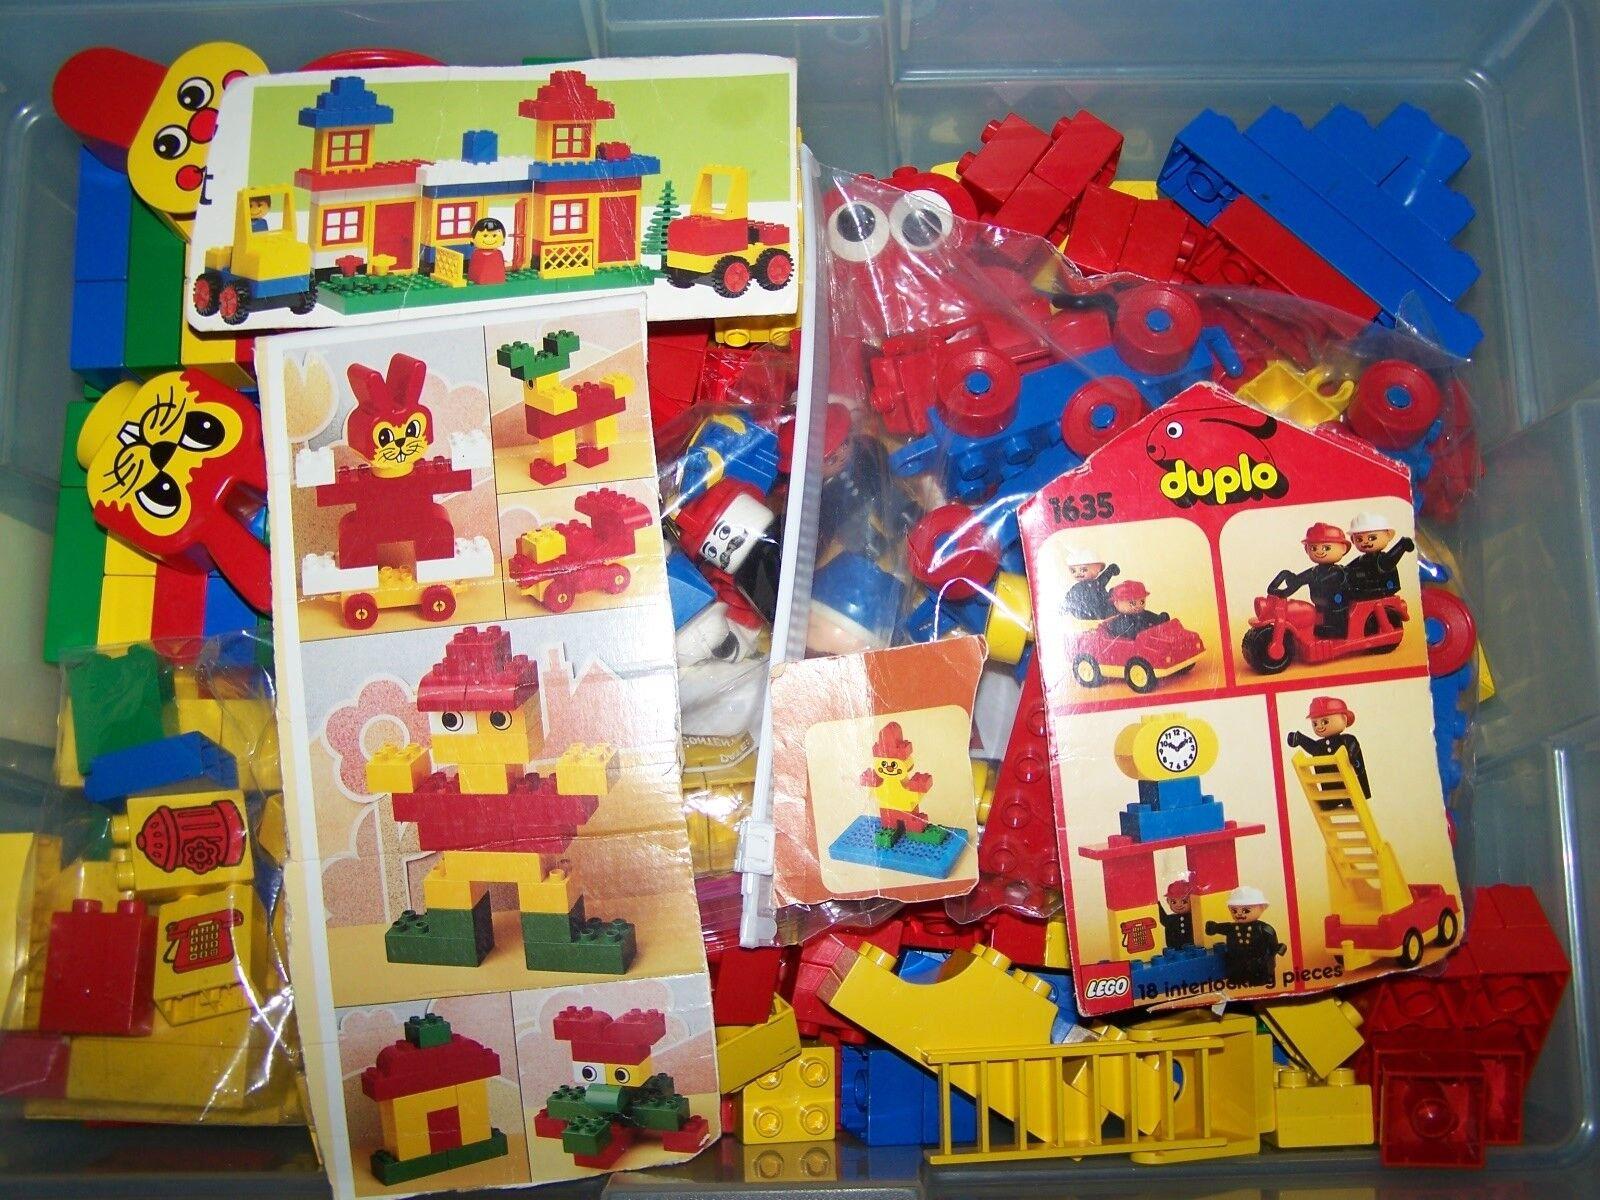 LEGO  DUPLO BUILDING BLOCKS 325 Pieces - 11 1 2  Vehicles, speziellty pieces VGC